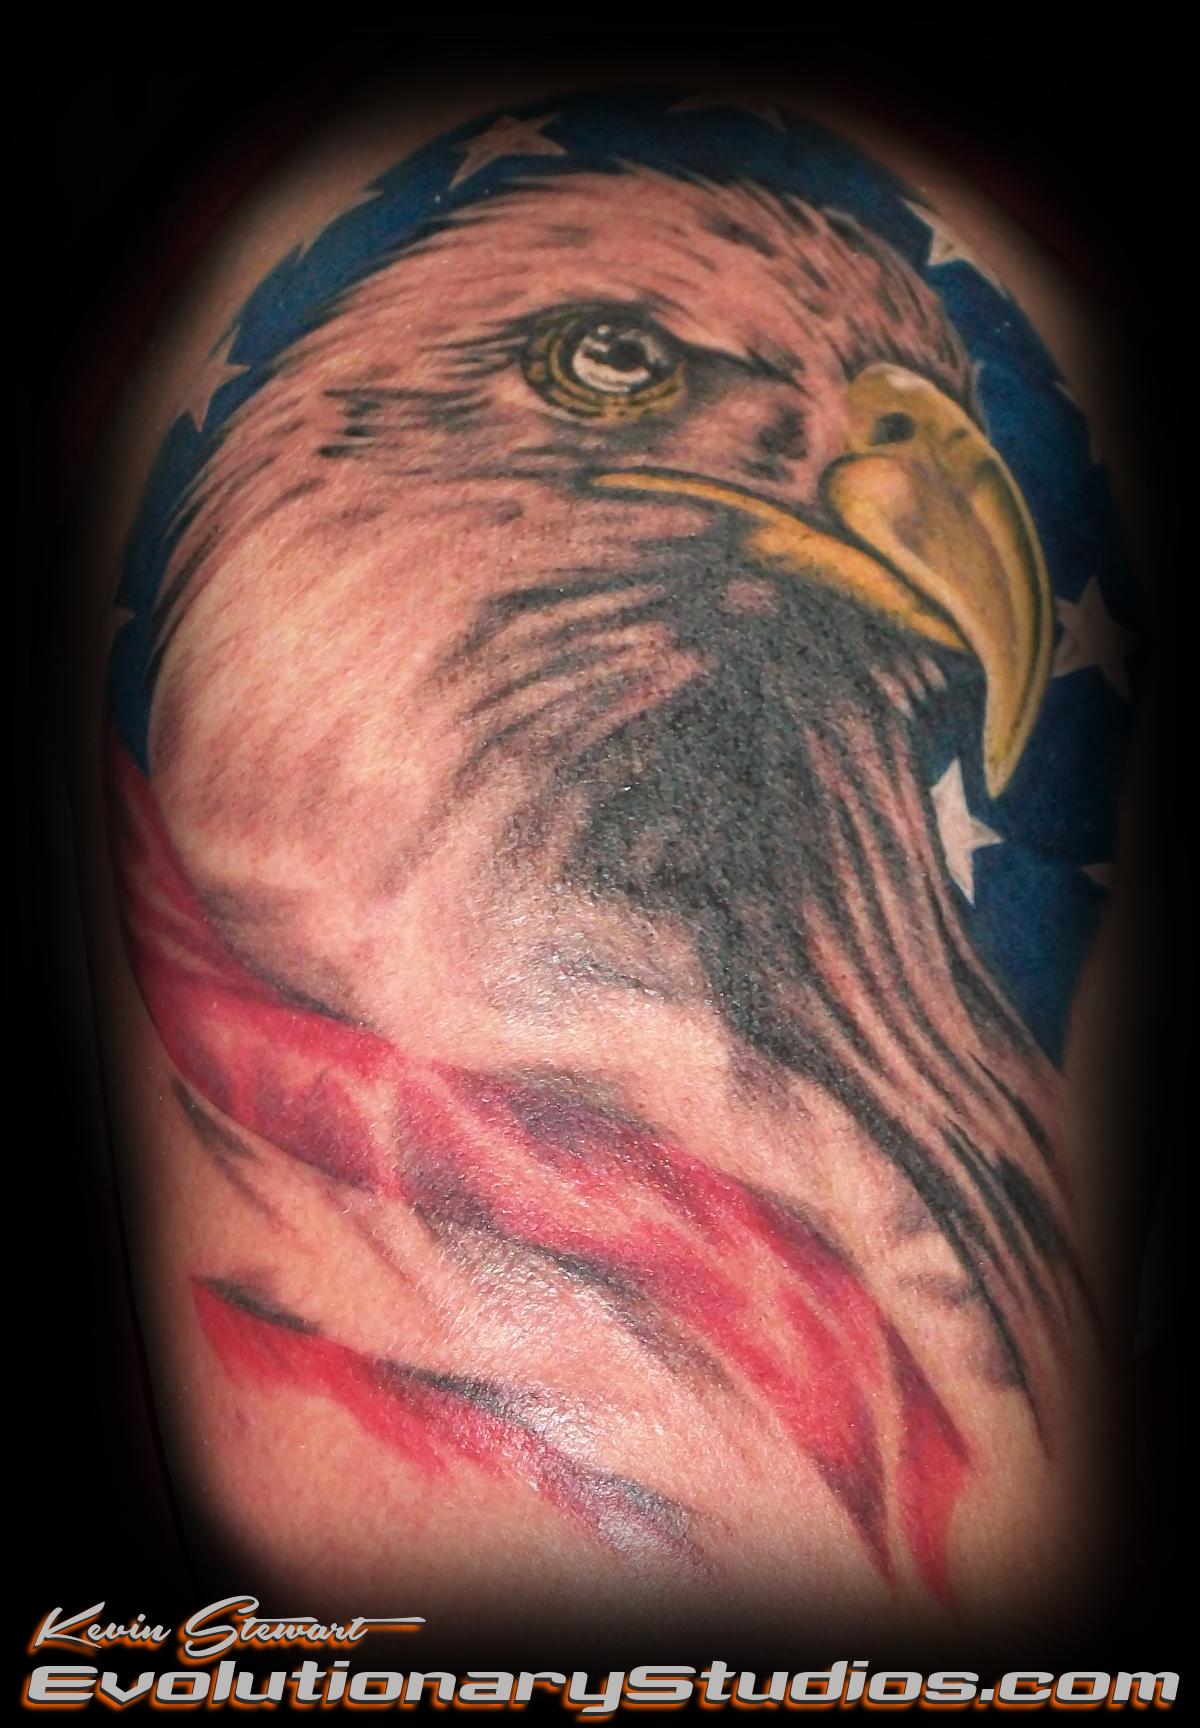 Evolutionary Studios | Tattoo, Piercing, & Body Modification